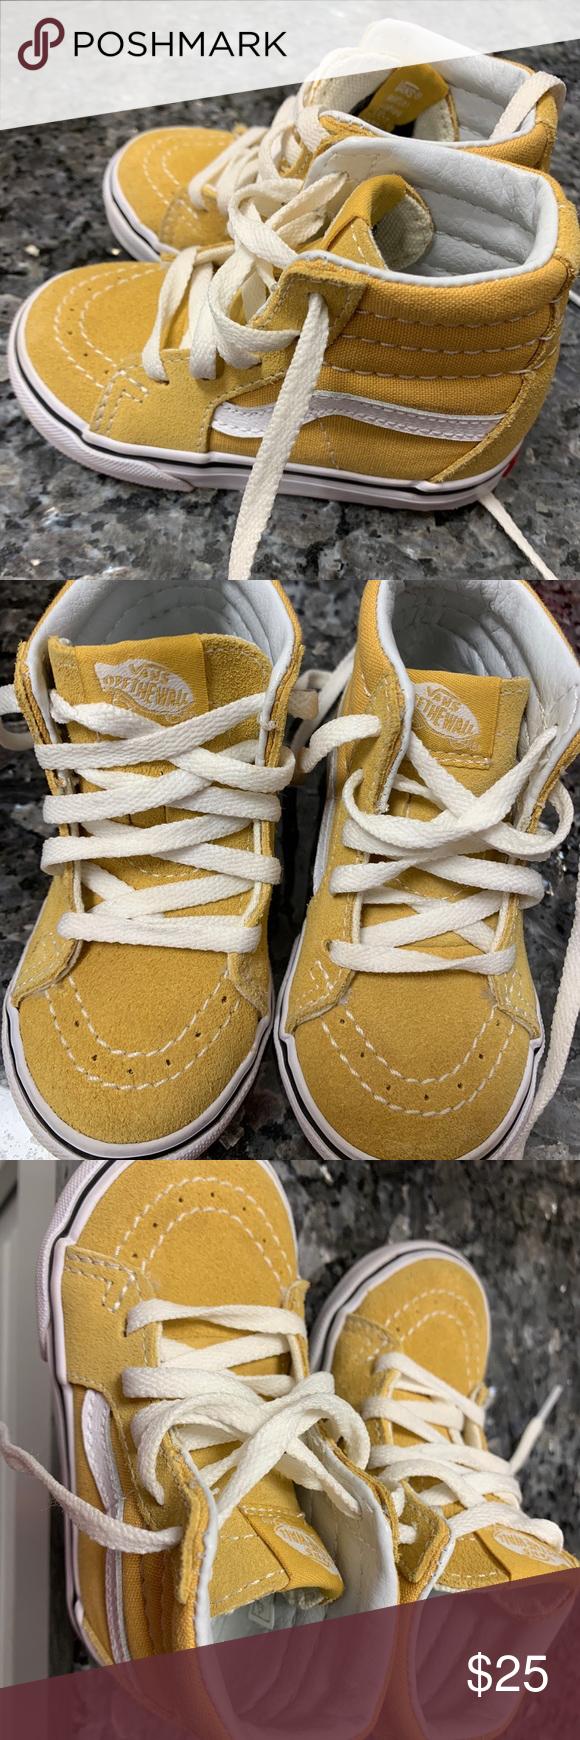 Toddler size 6 Yellow/Mustard High Top